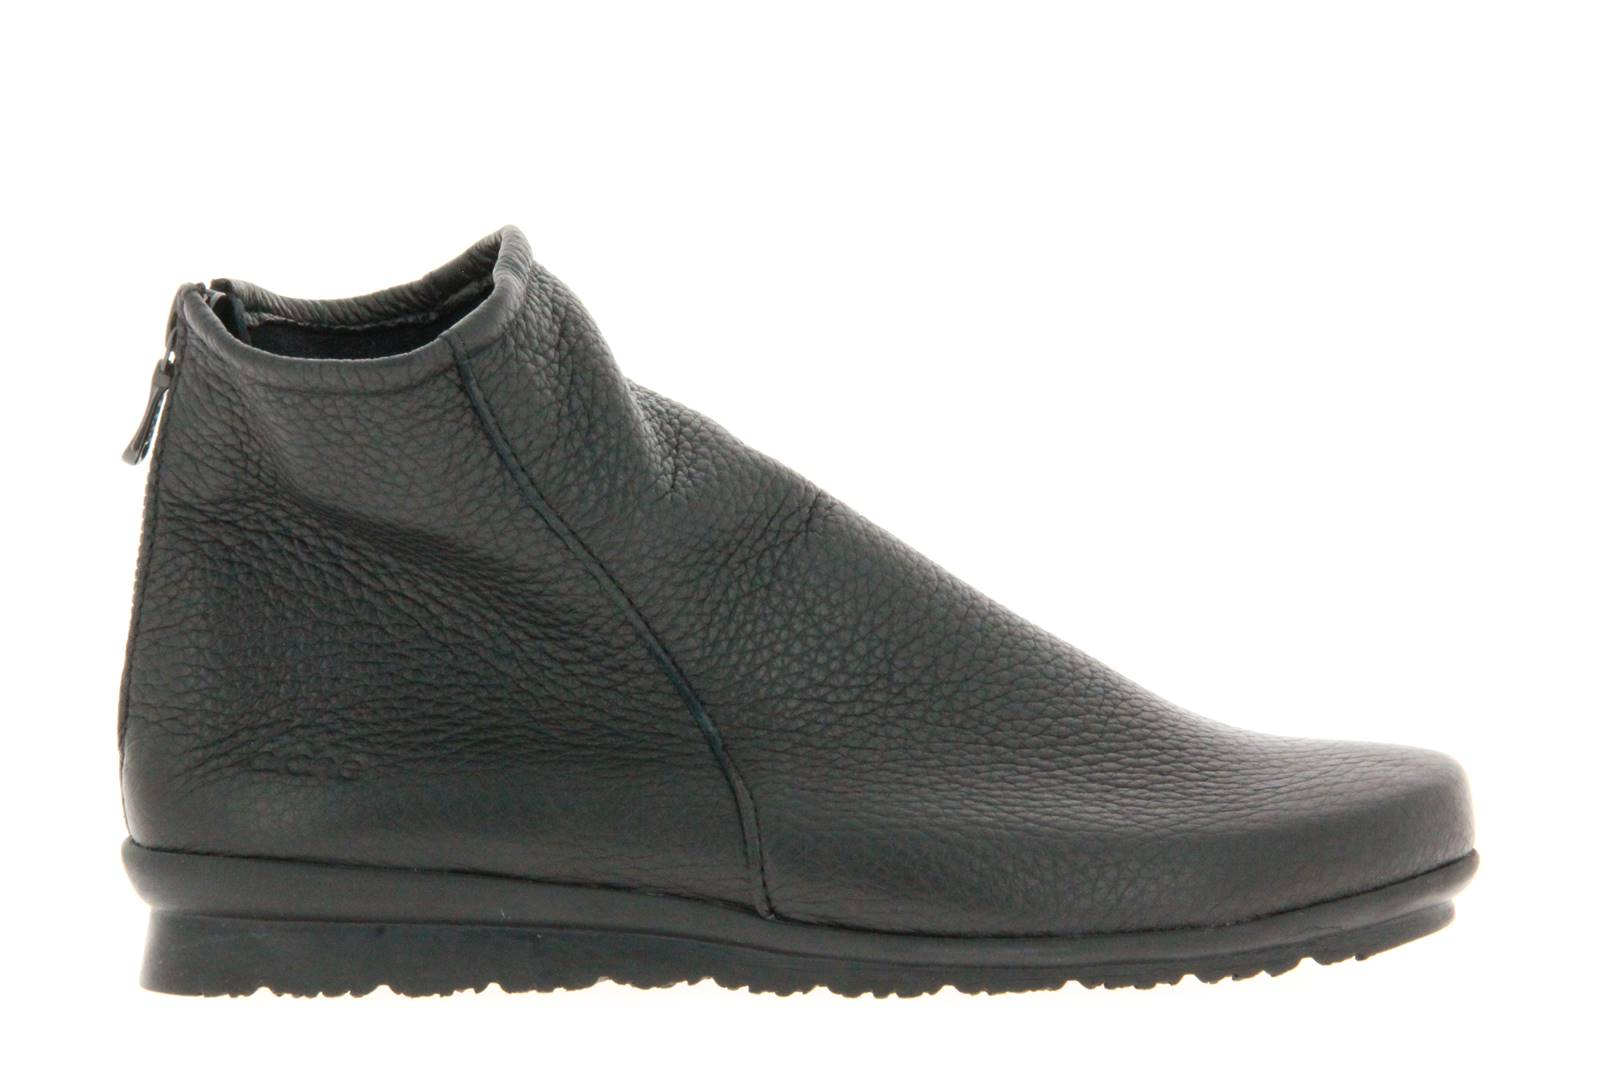 Arche ankle boots BARYKY CERF PLEINE FLEUR NOIR